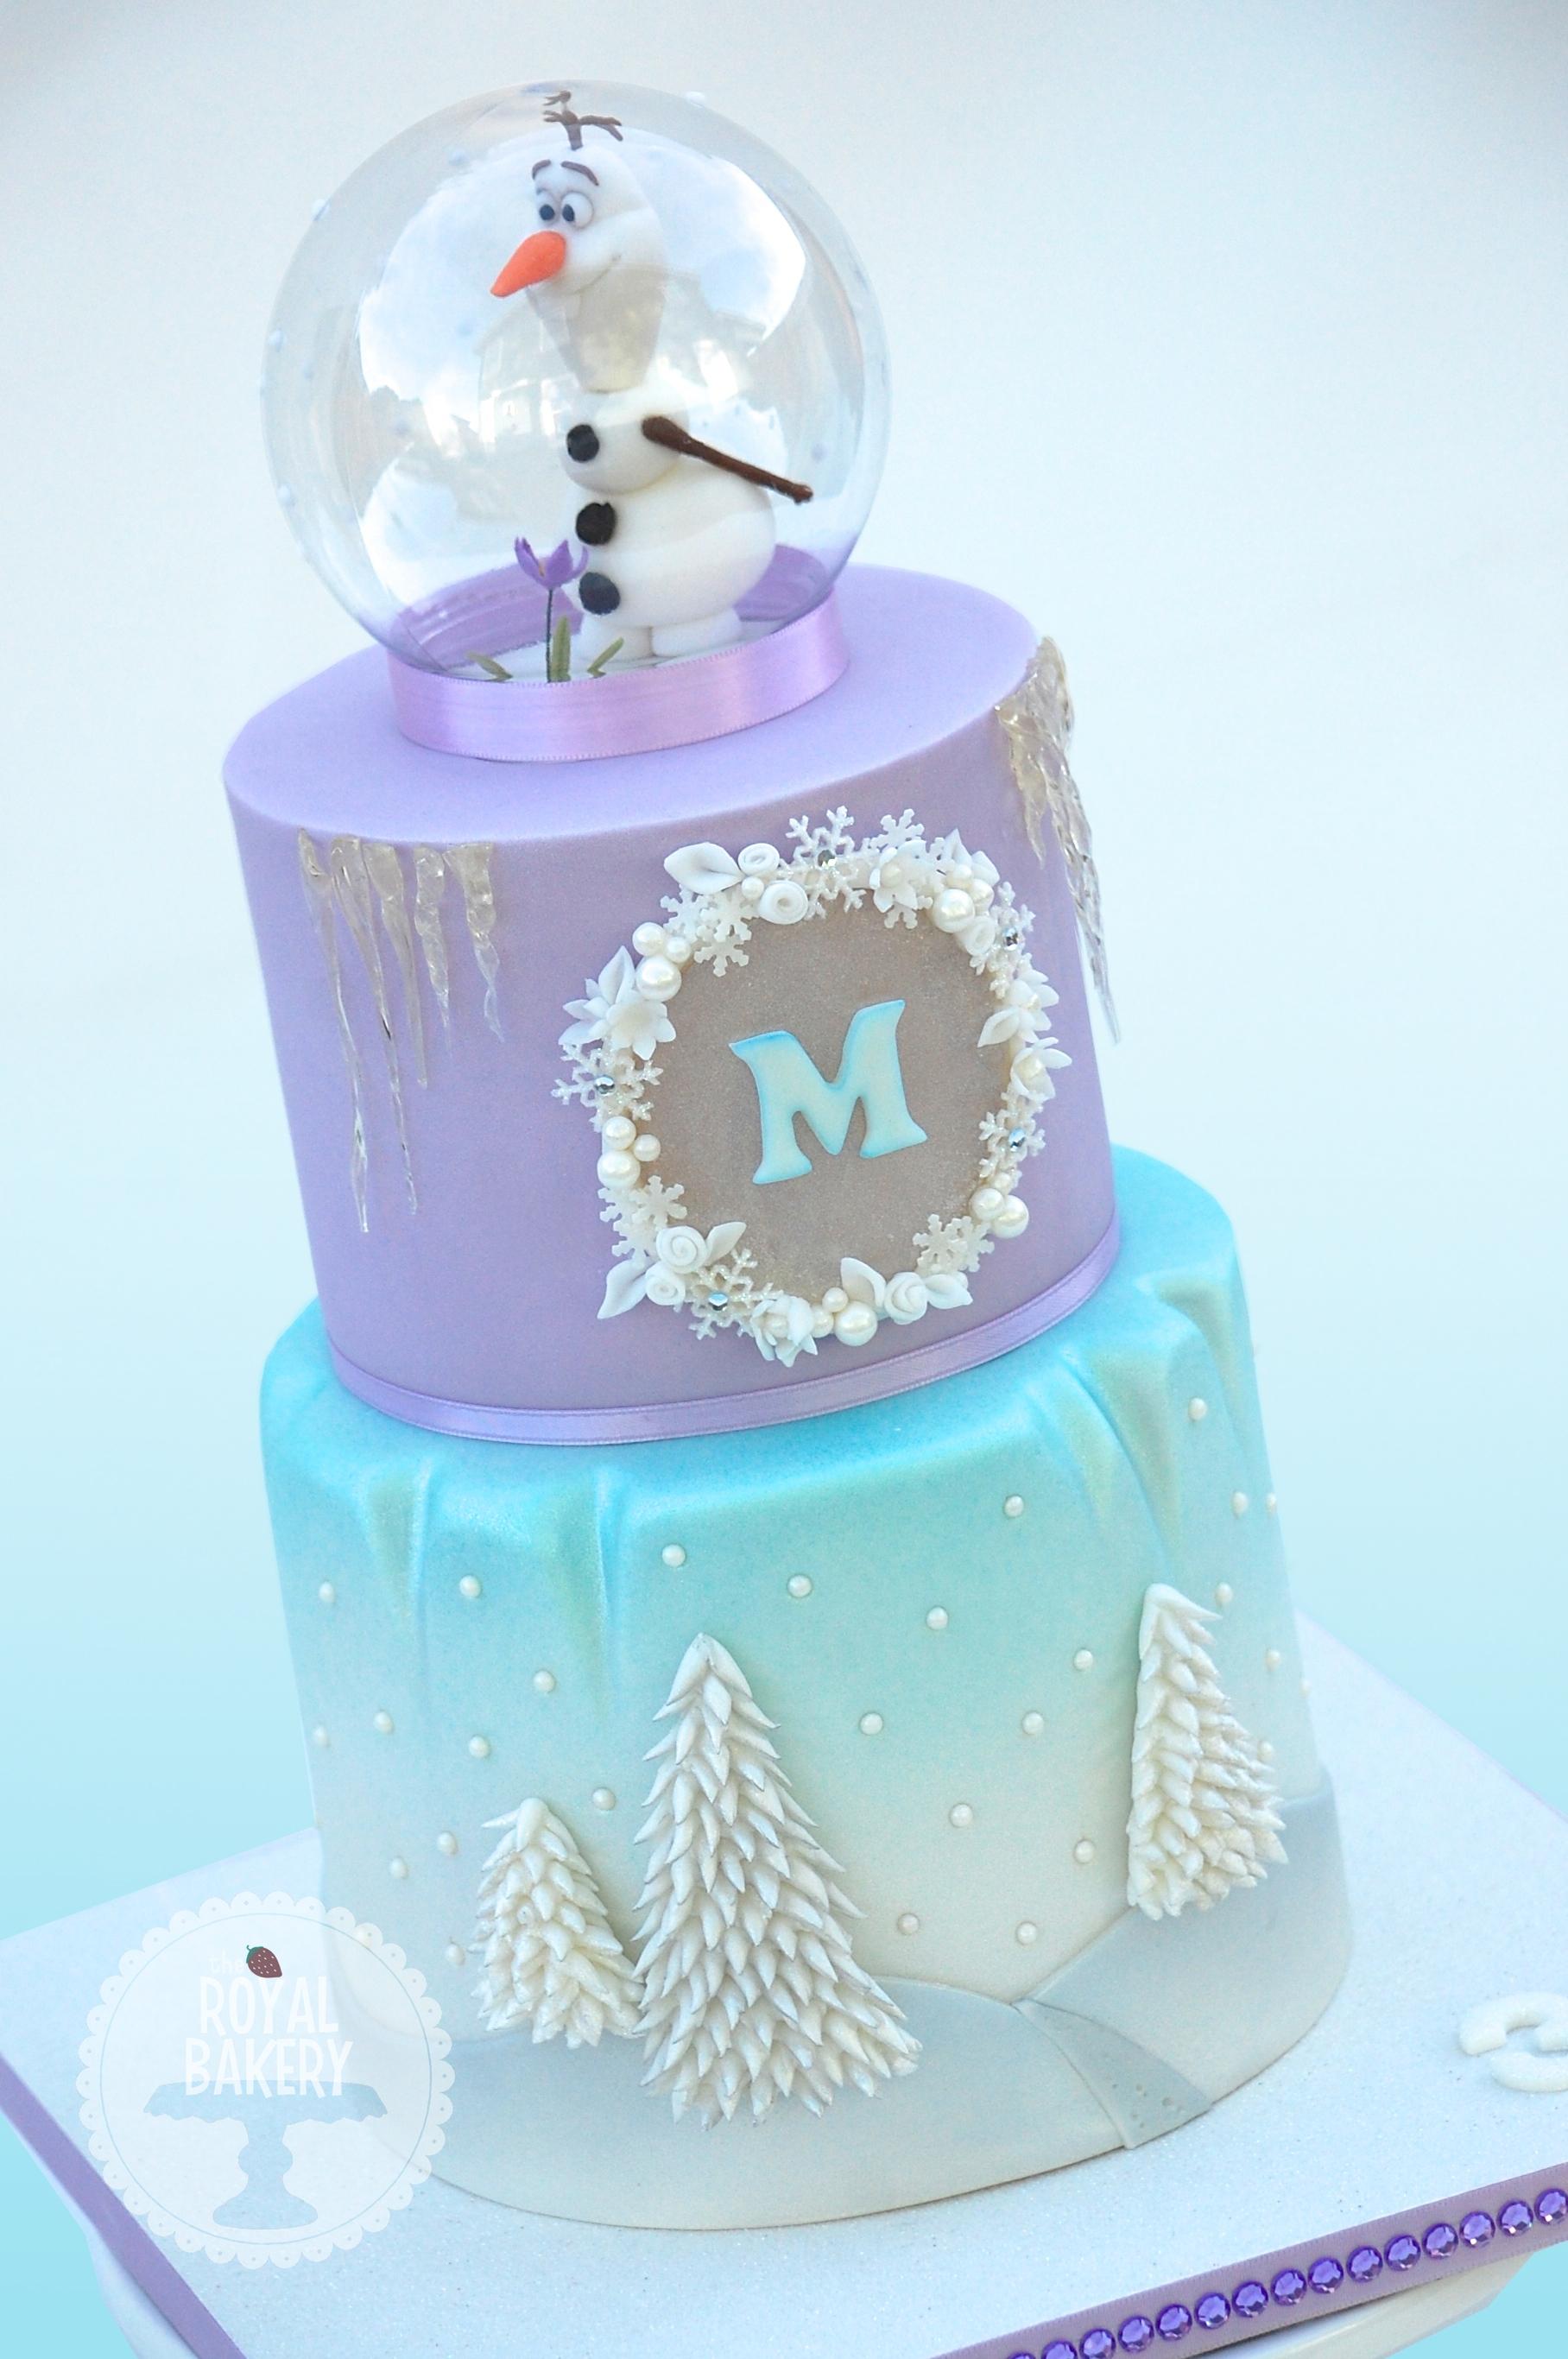 How To Make A Snow Globe Cake Topper